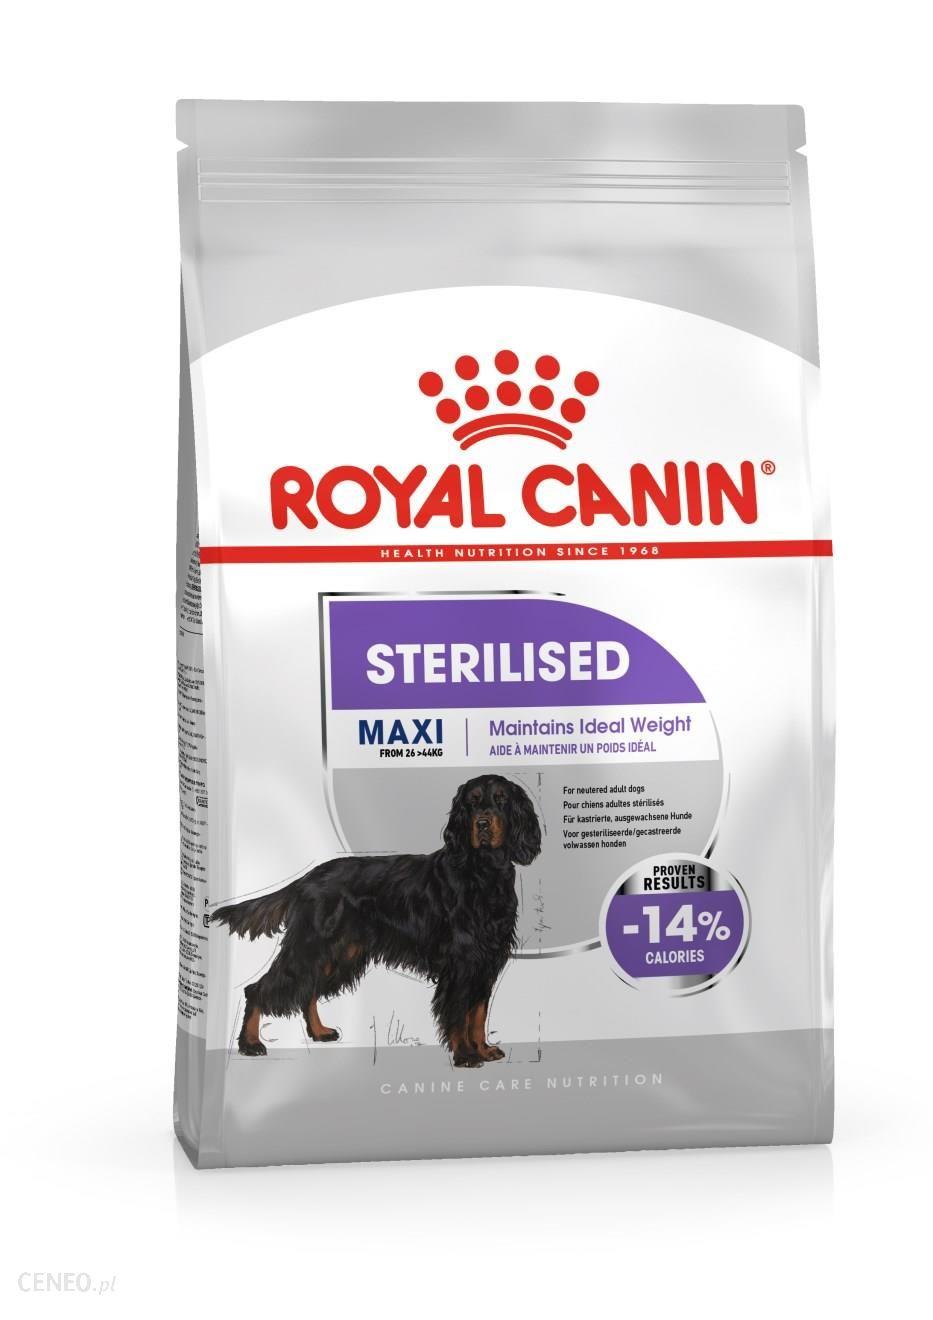 Royal Canin Maxi Sterilised 2x9Kg